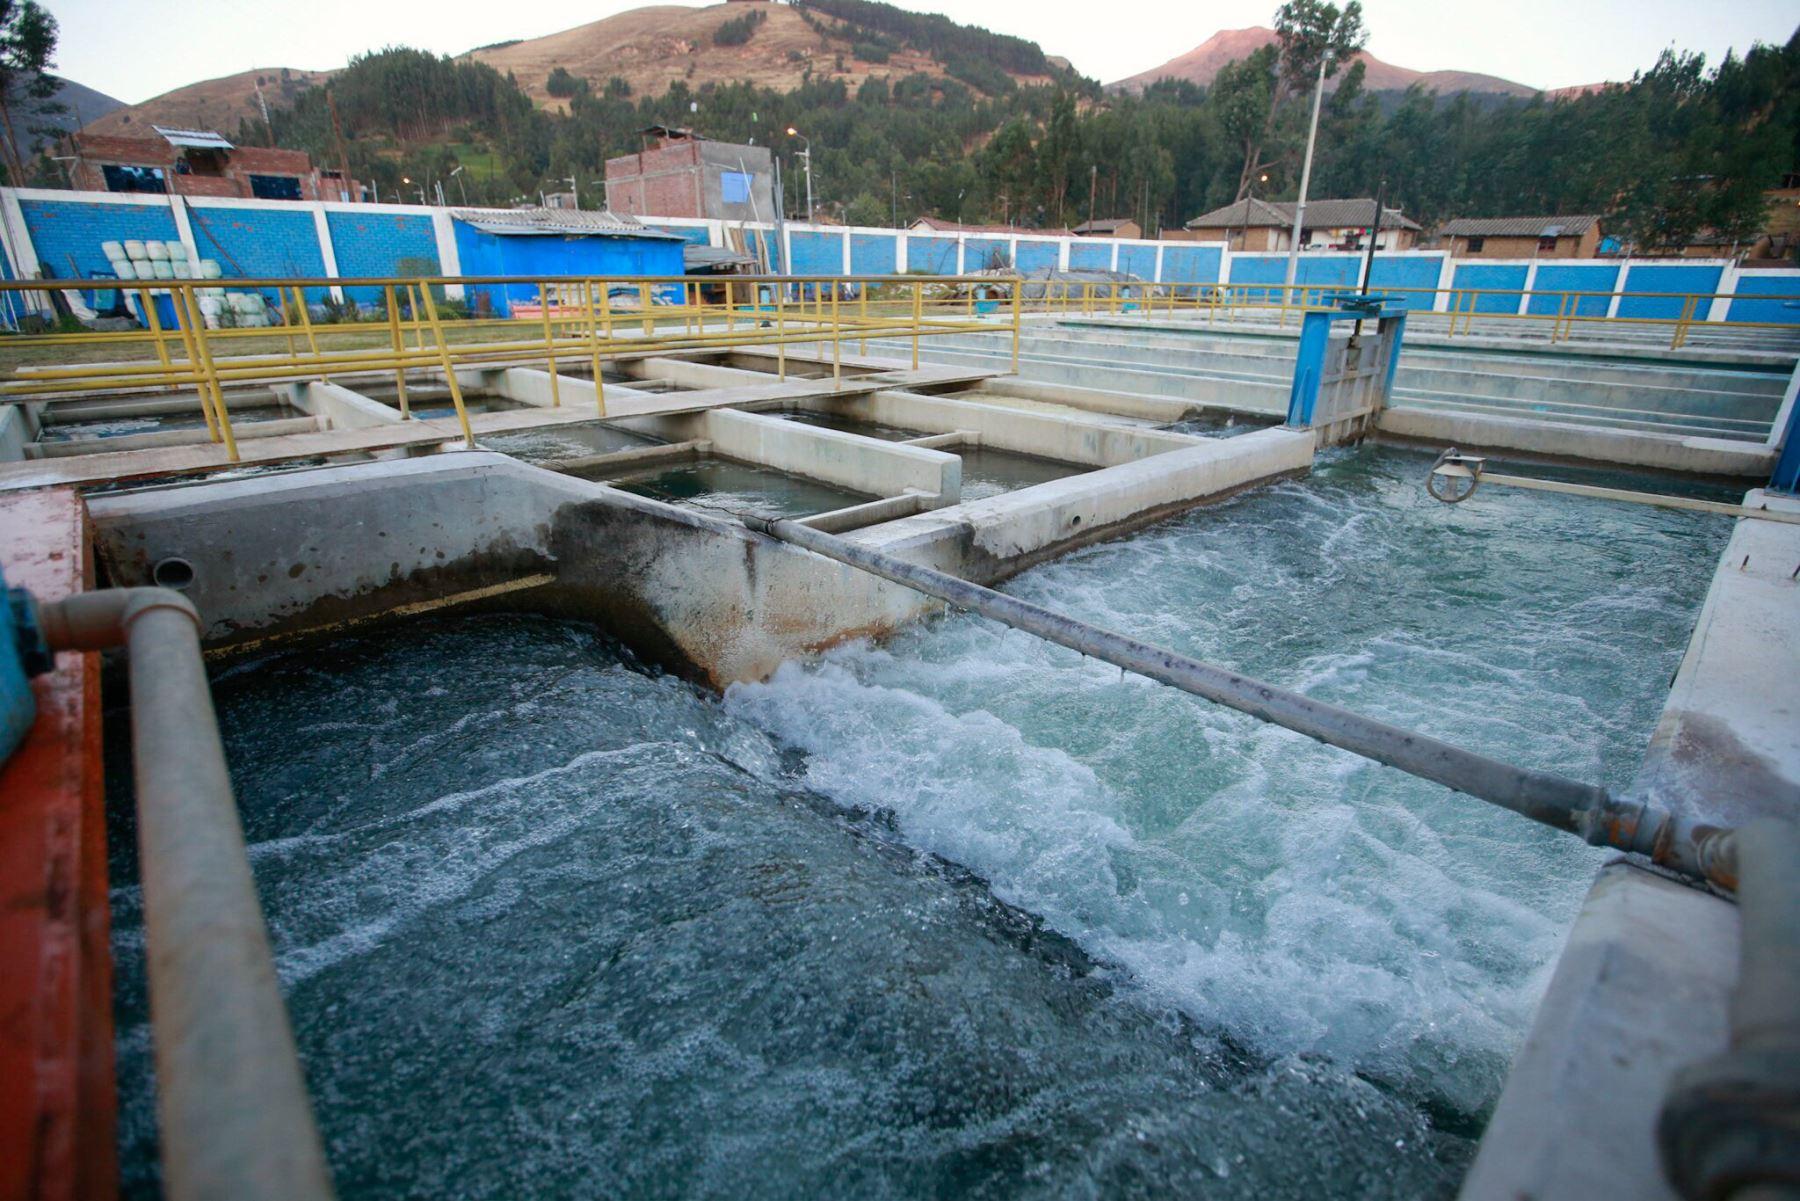 Ministerio de Vivienda pondrá fin a concesión del servicio de agua potable en Tumbes. ANDINA/Difusión